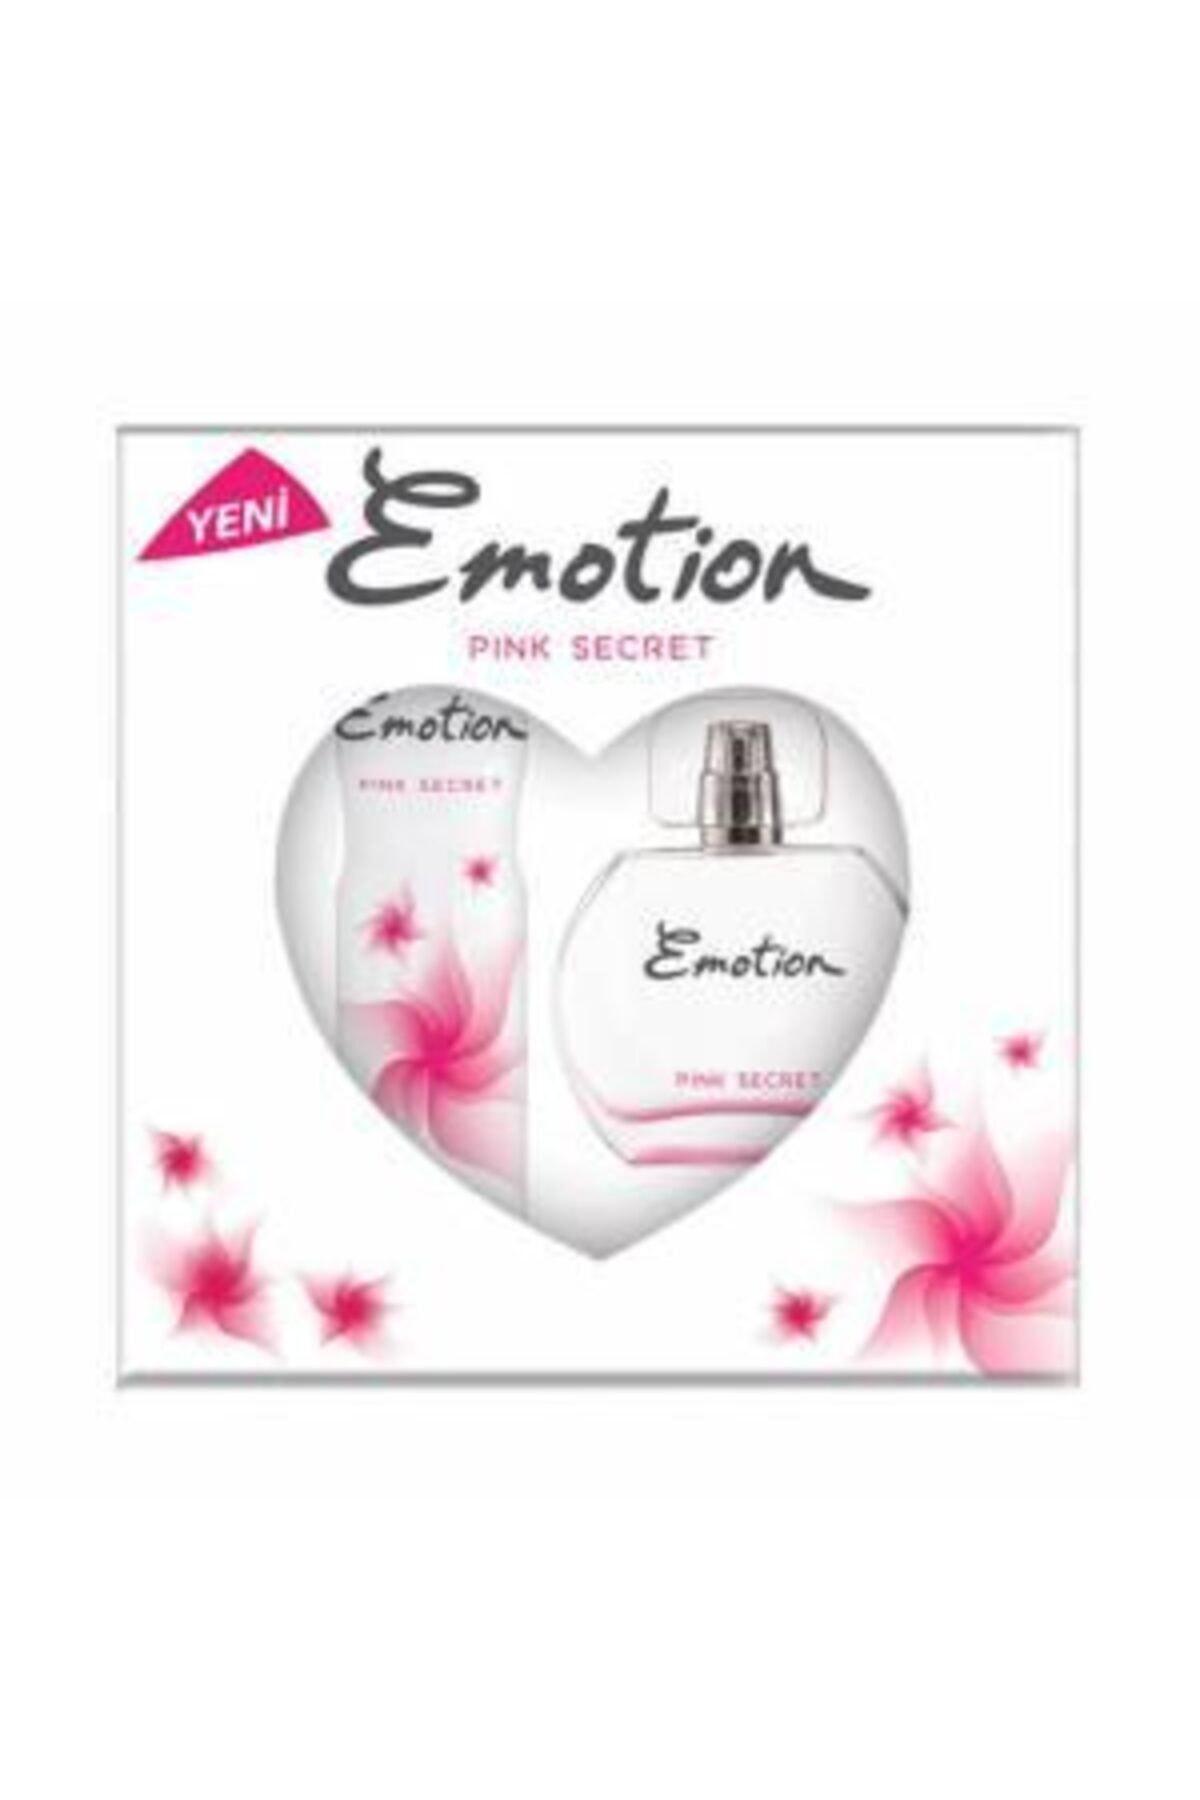 Emotion Pınk Secret Bayan Edt 50 Ml + 150 Ml Deodorant Parfüm Seti 2